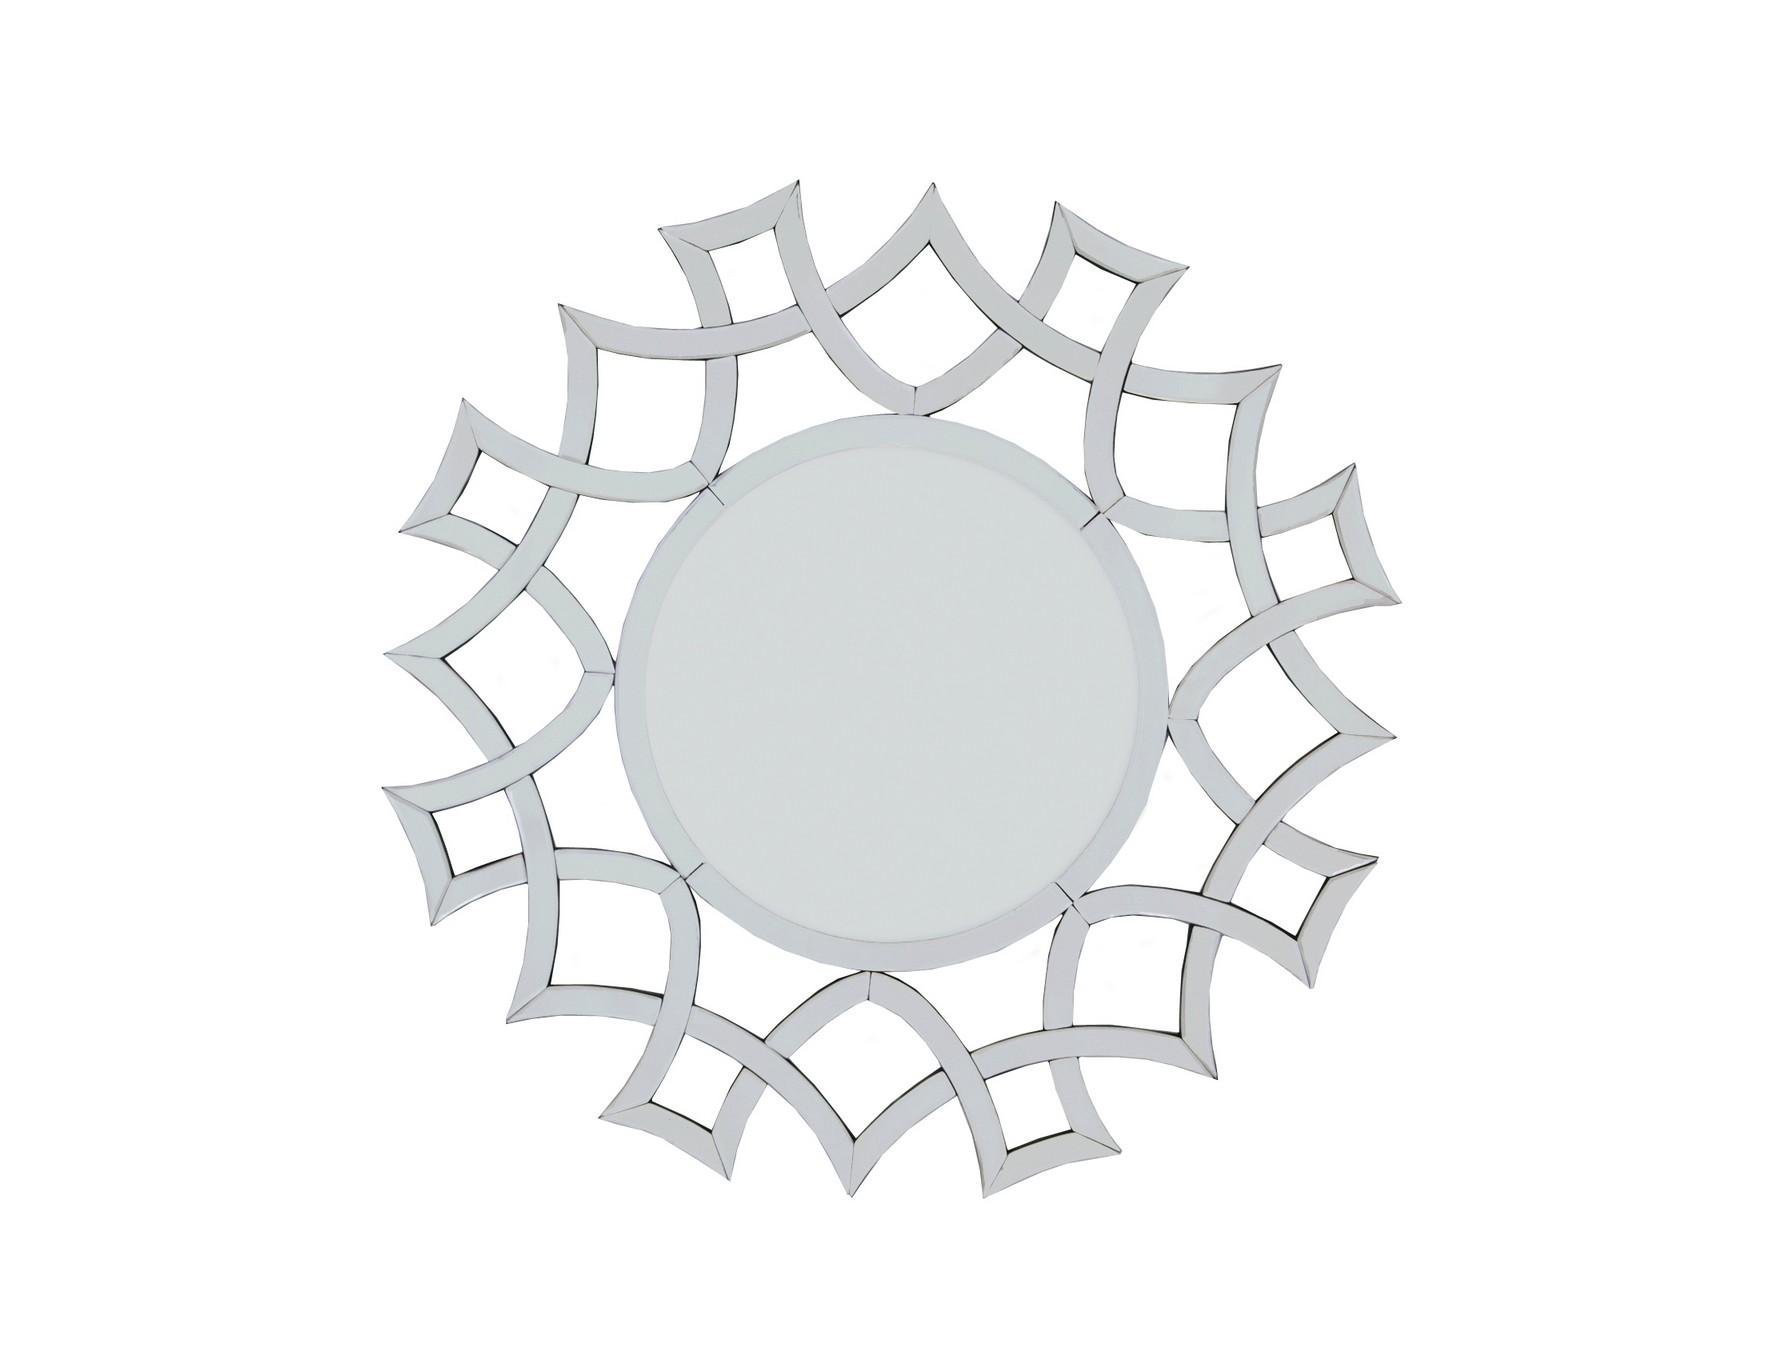 Зеркало demetria (mak-interior) серый 100x100x1 см. фото